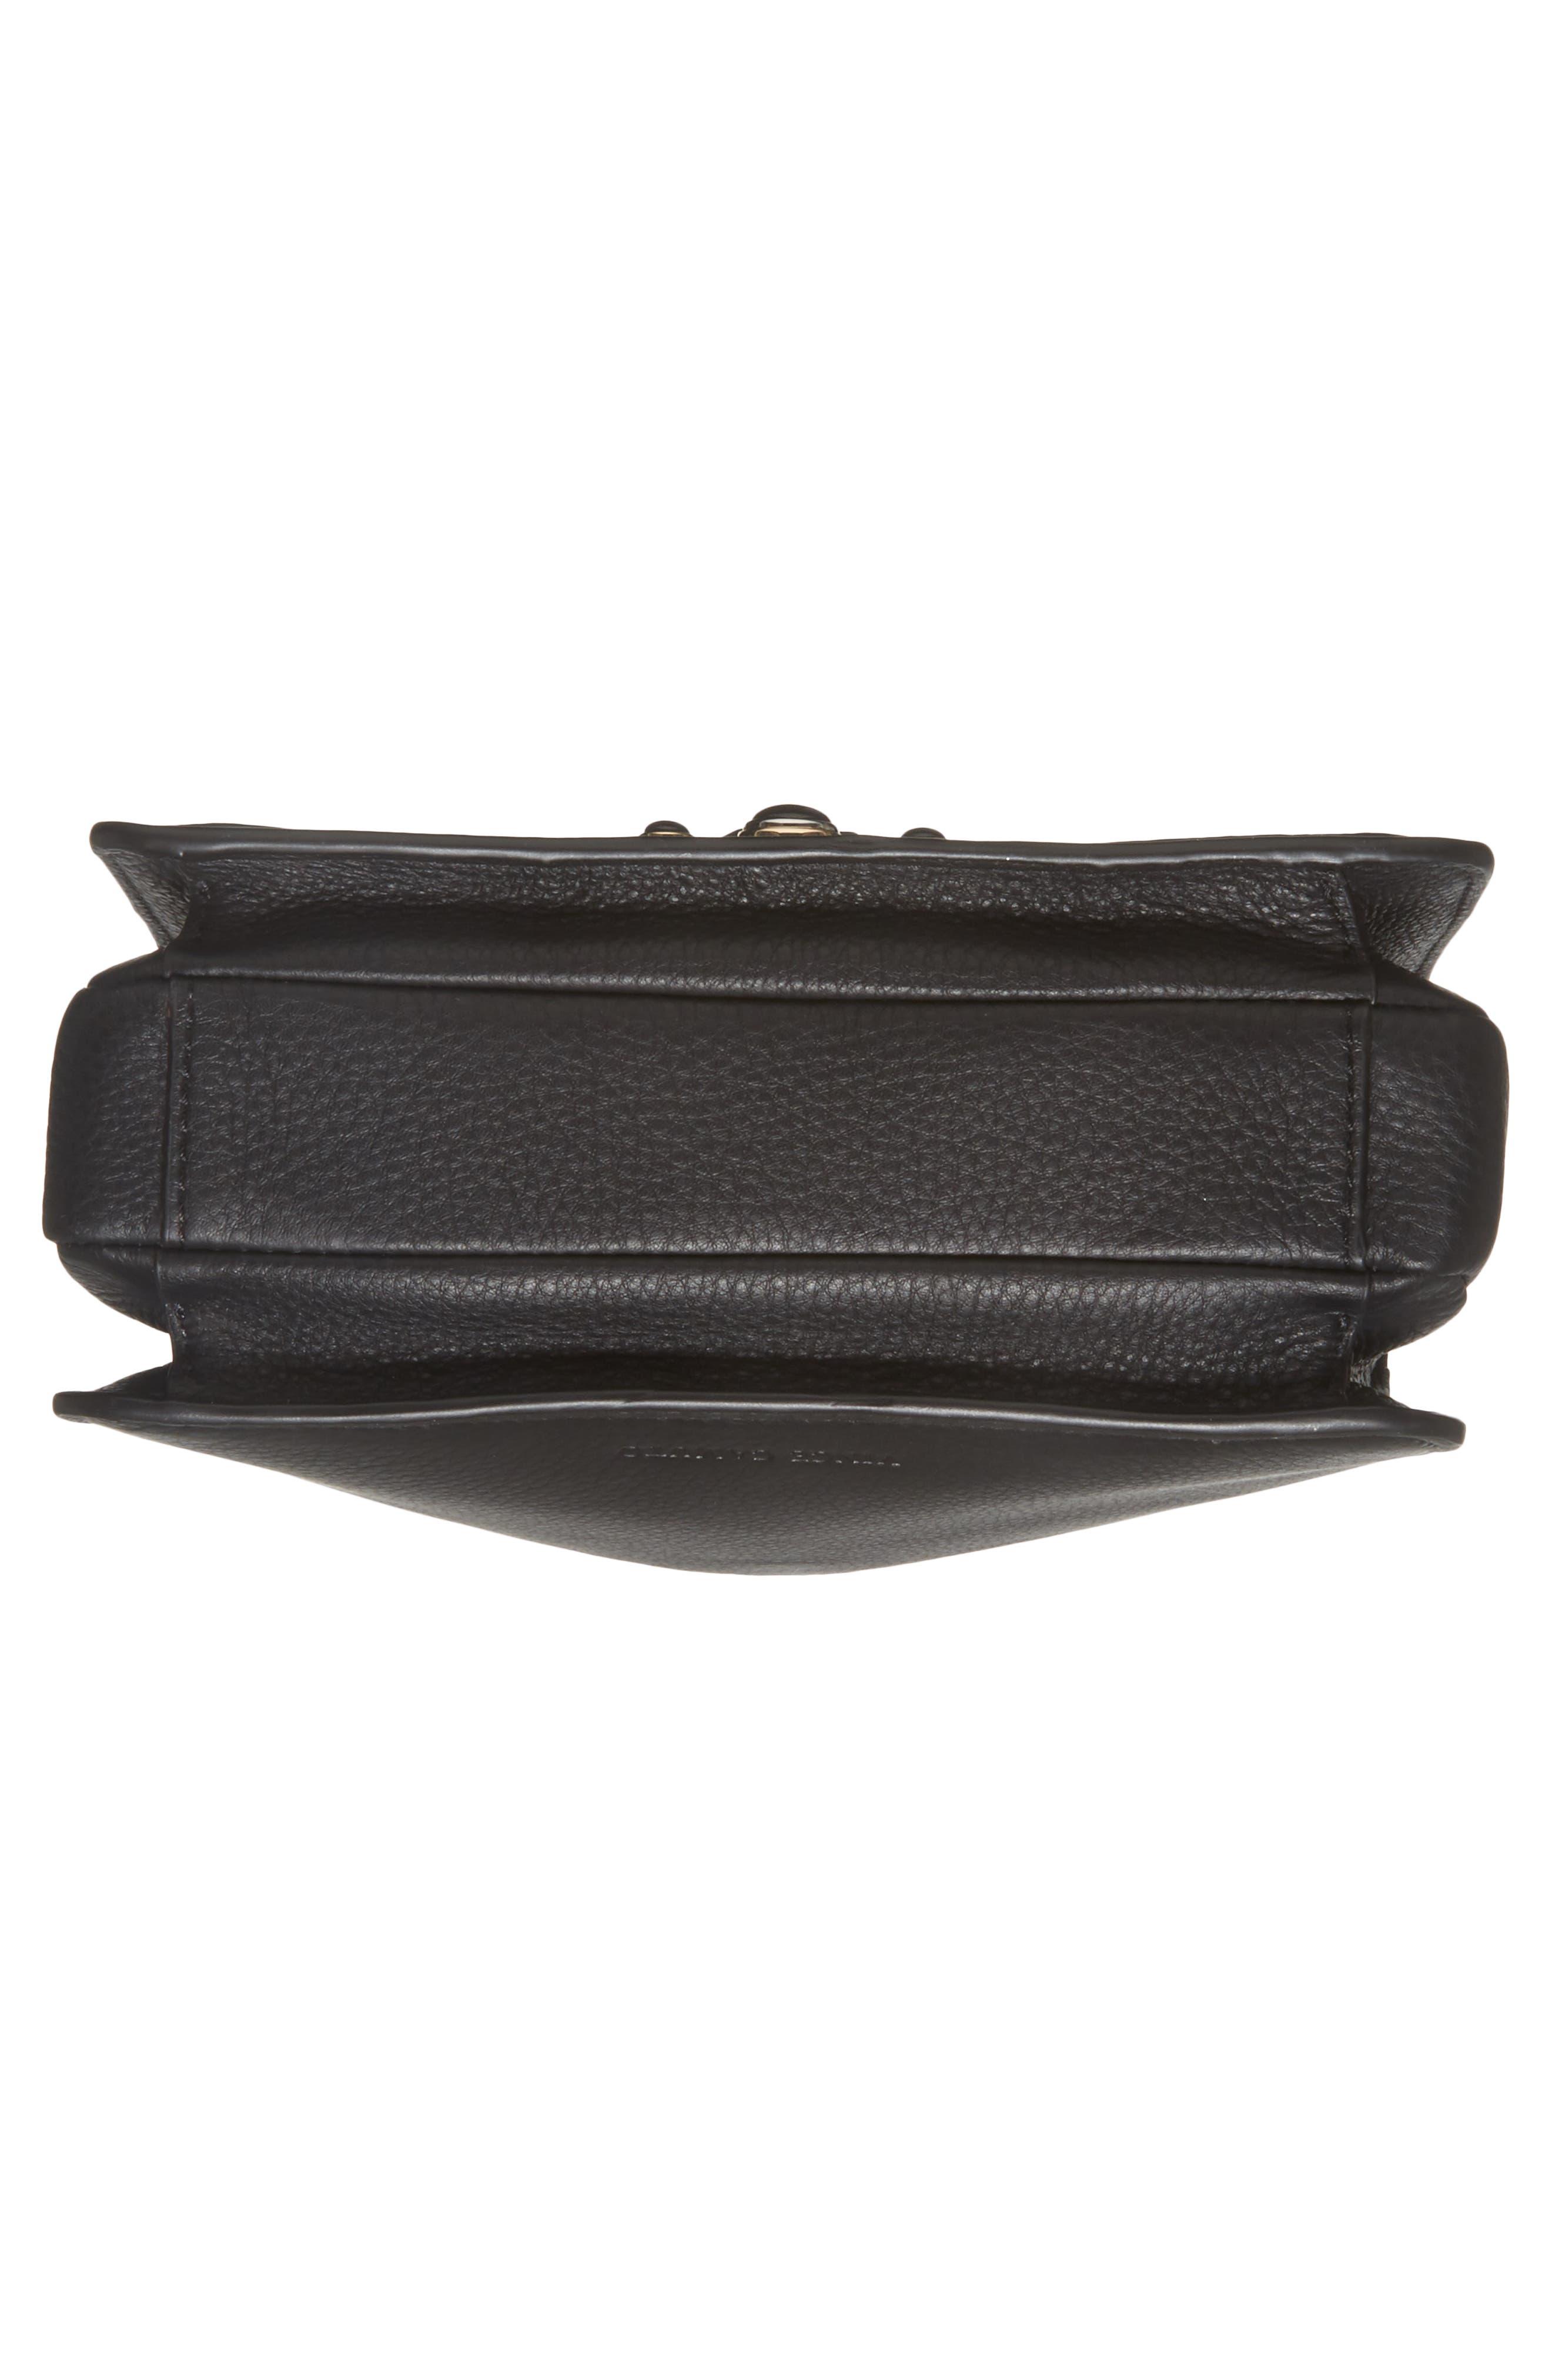 Bitty Studded Leather Shoulder Bag,                             Alternate thumbnail 6, color,                             002